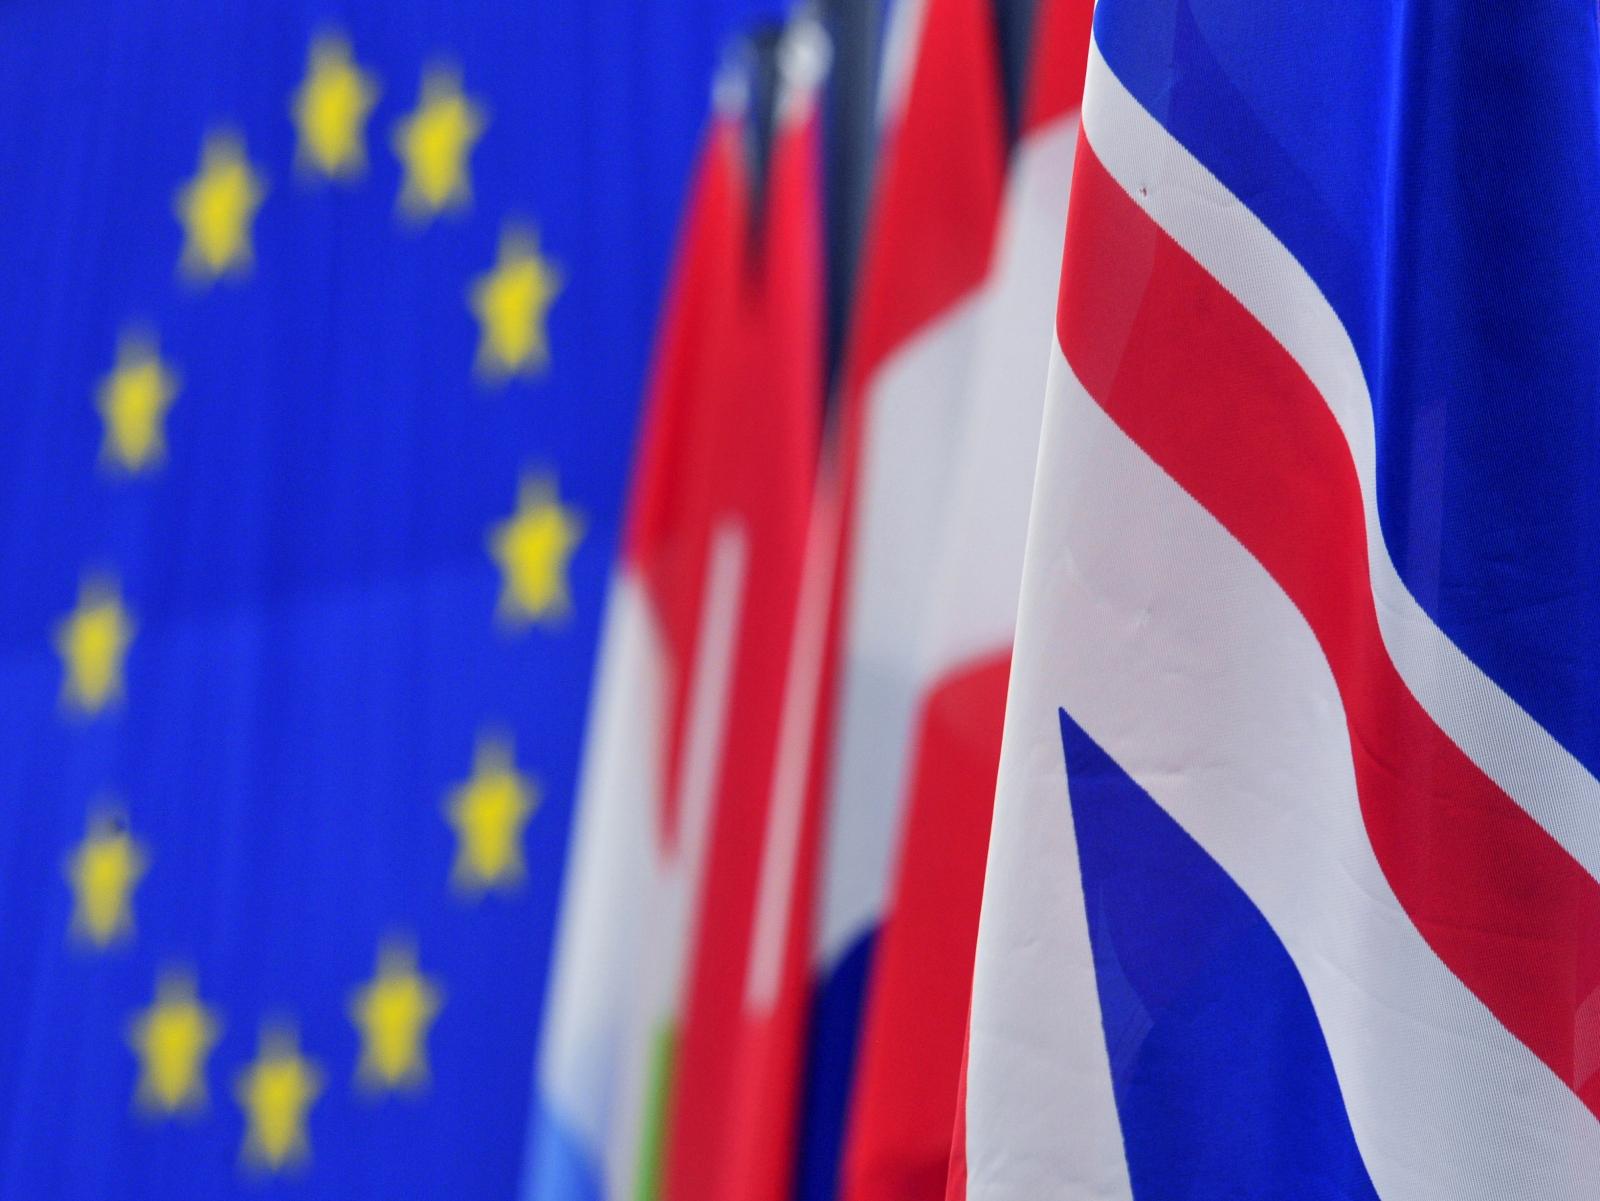 European authorities may fine Google, Facebook, Twitter